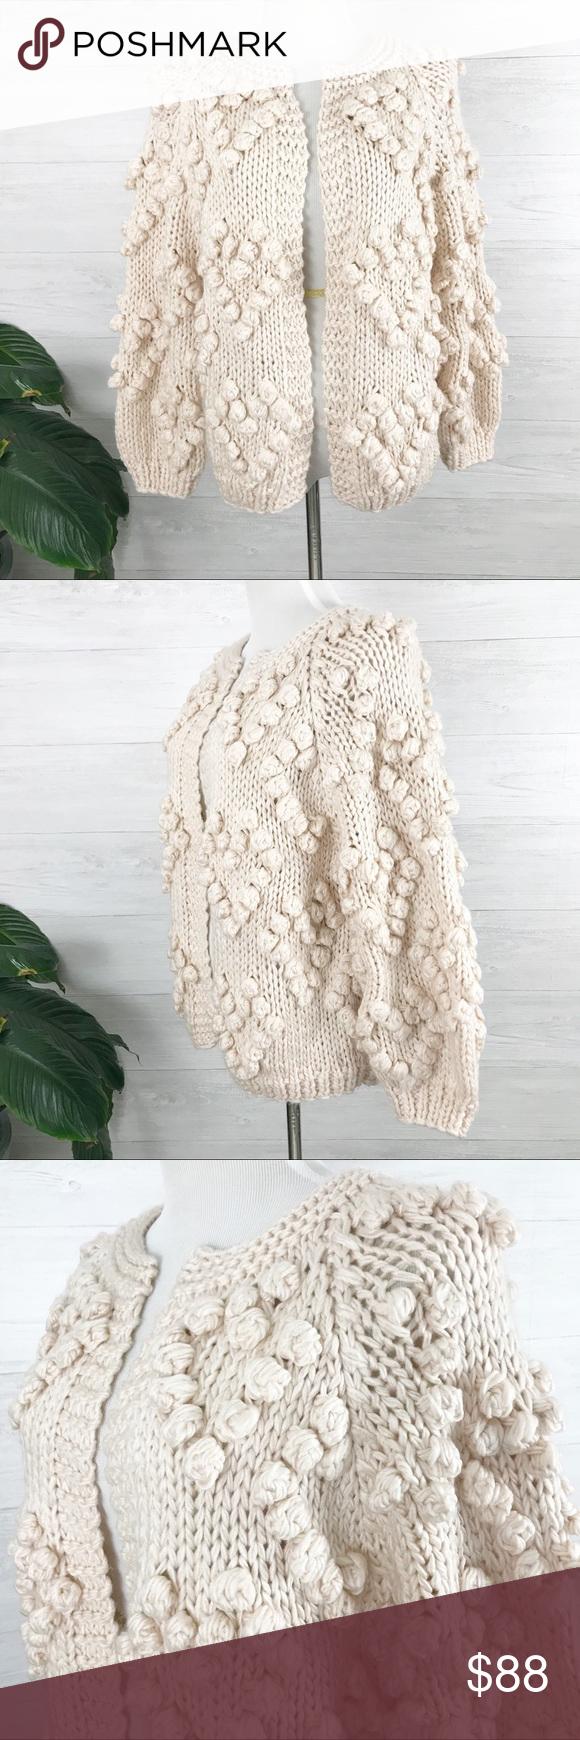 Nwt Chicwish Knit Your Love Cardigan Sweater L Xl Yarn Ball Ball Trim Hand Knitting